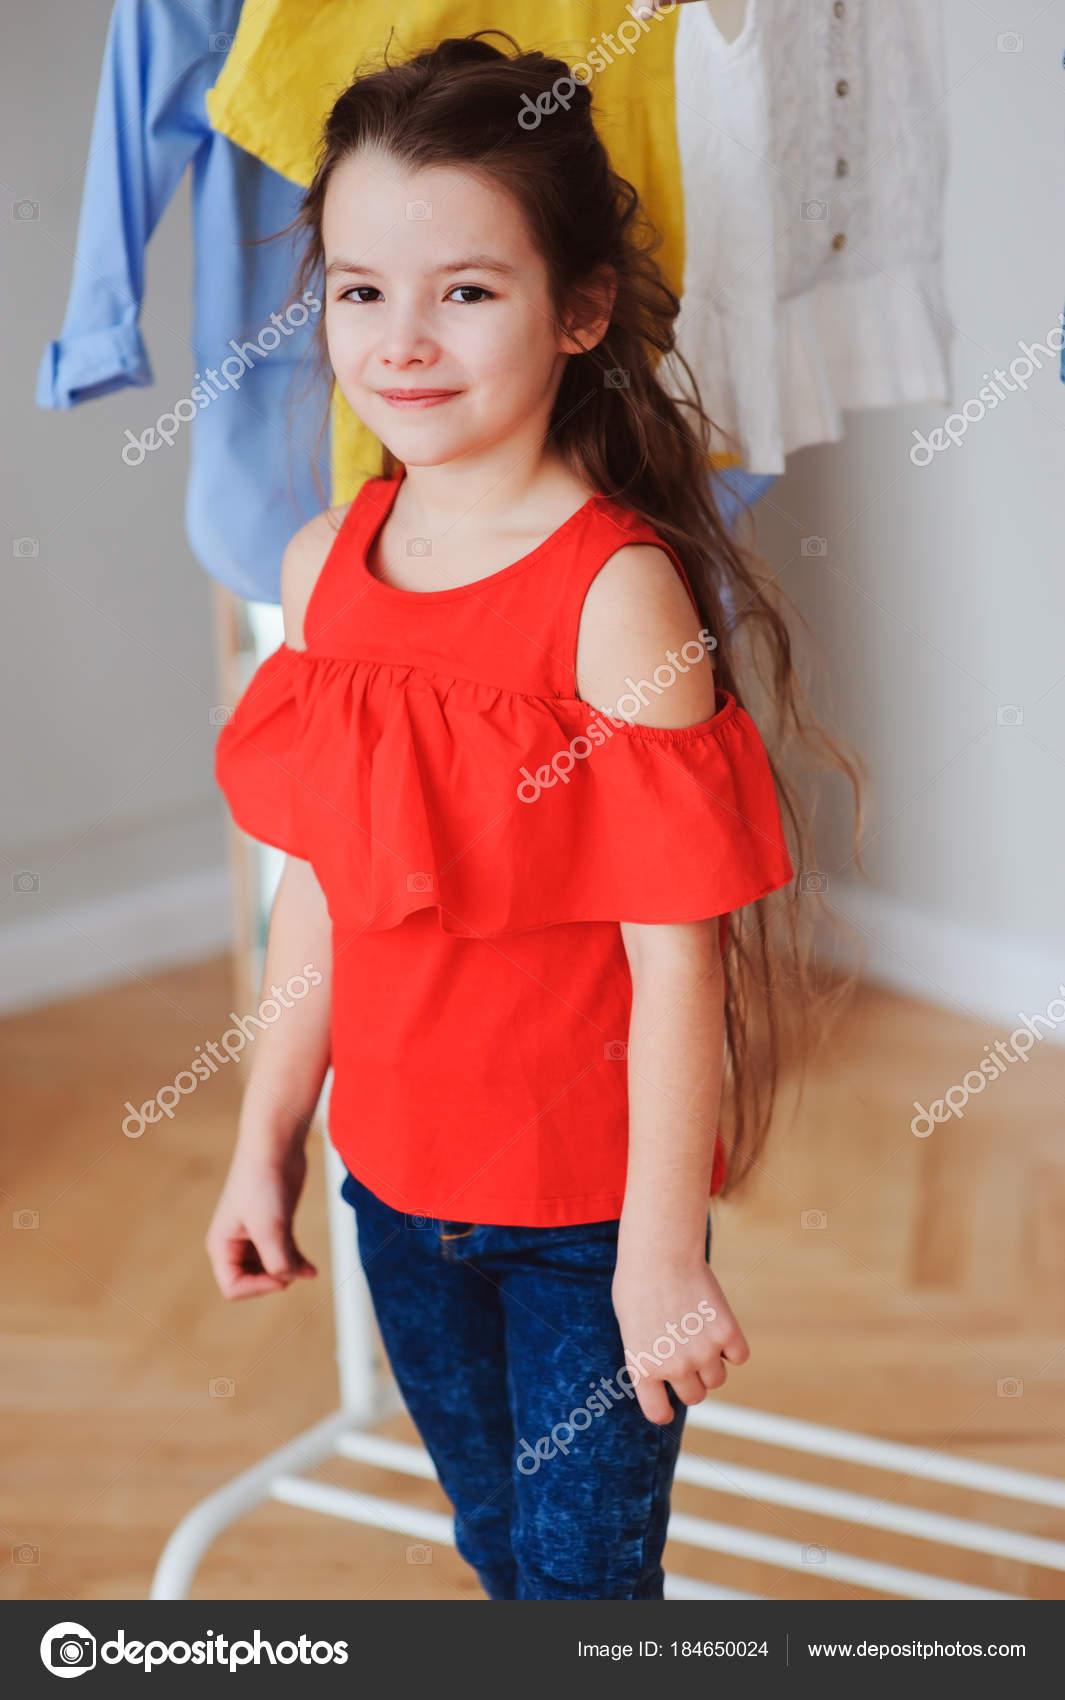 bb0ce2e169db Cute Little Child Girl Choosing New Modern Clothes Her Wardrobe ...